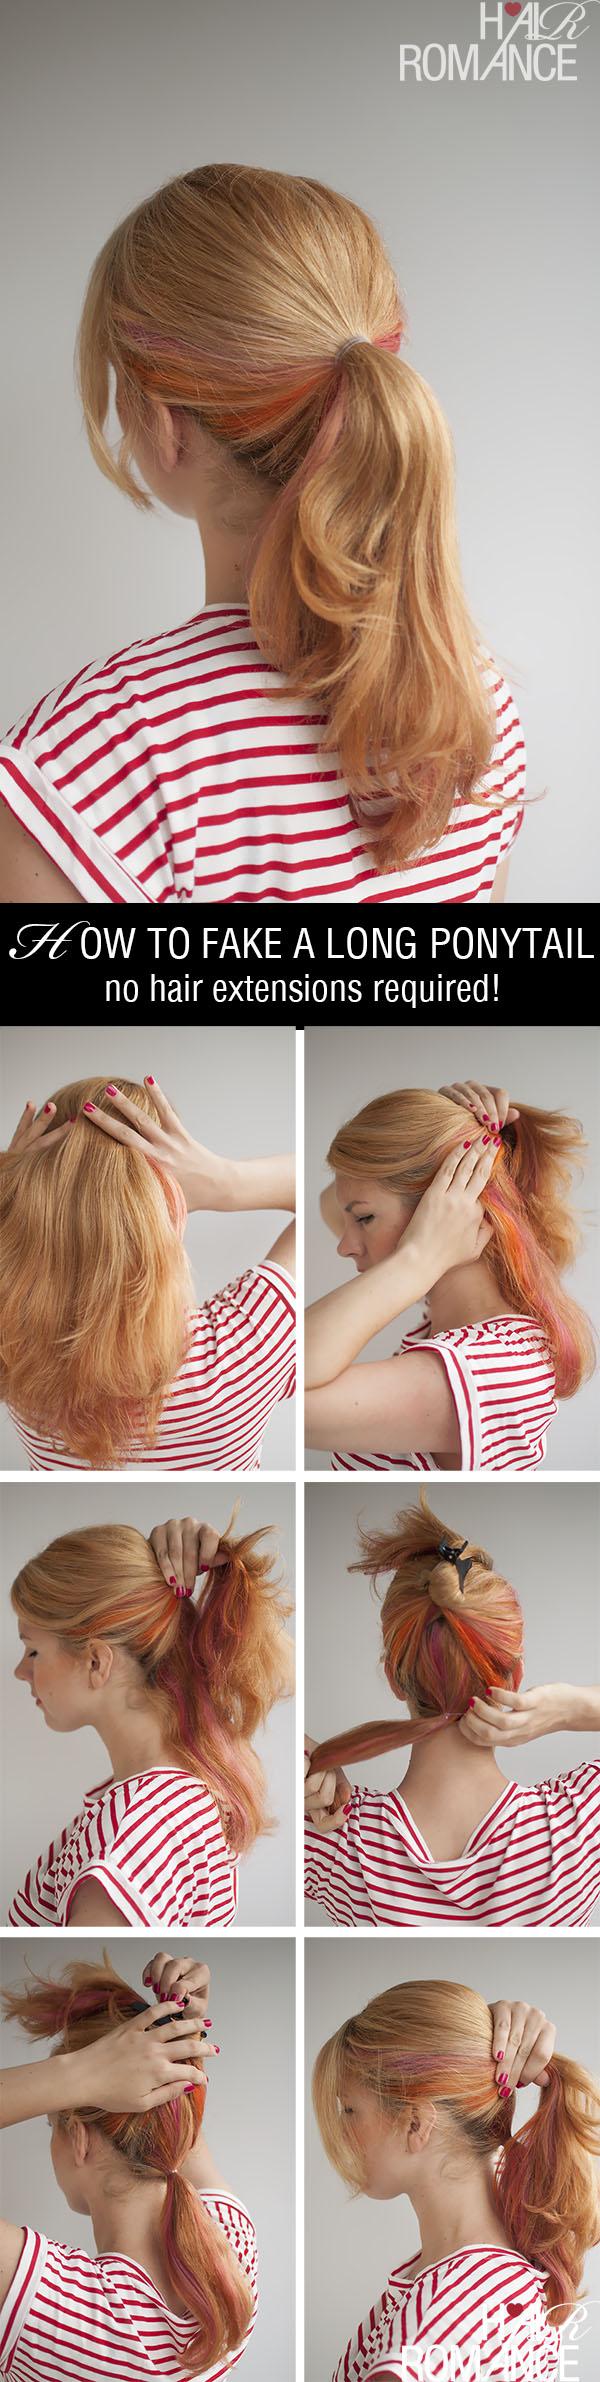 Hair Romance - how to fake a long ponytail hair tutorial